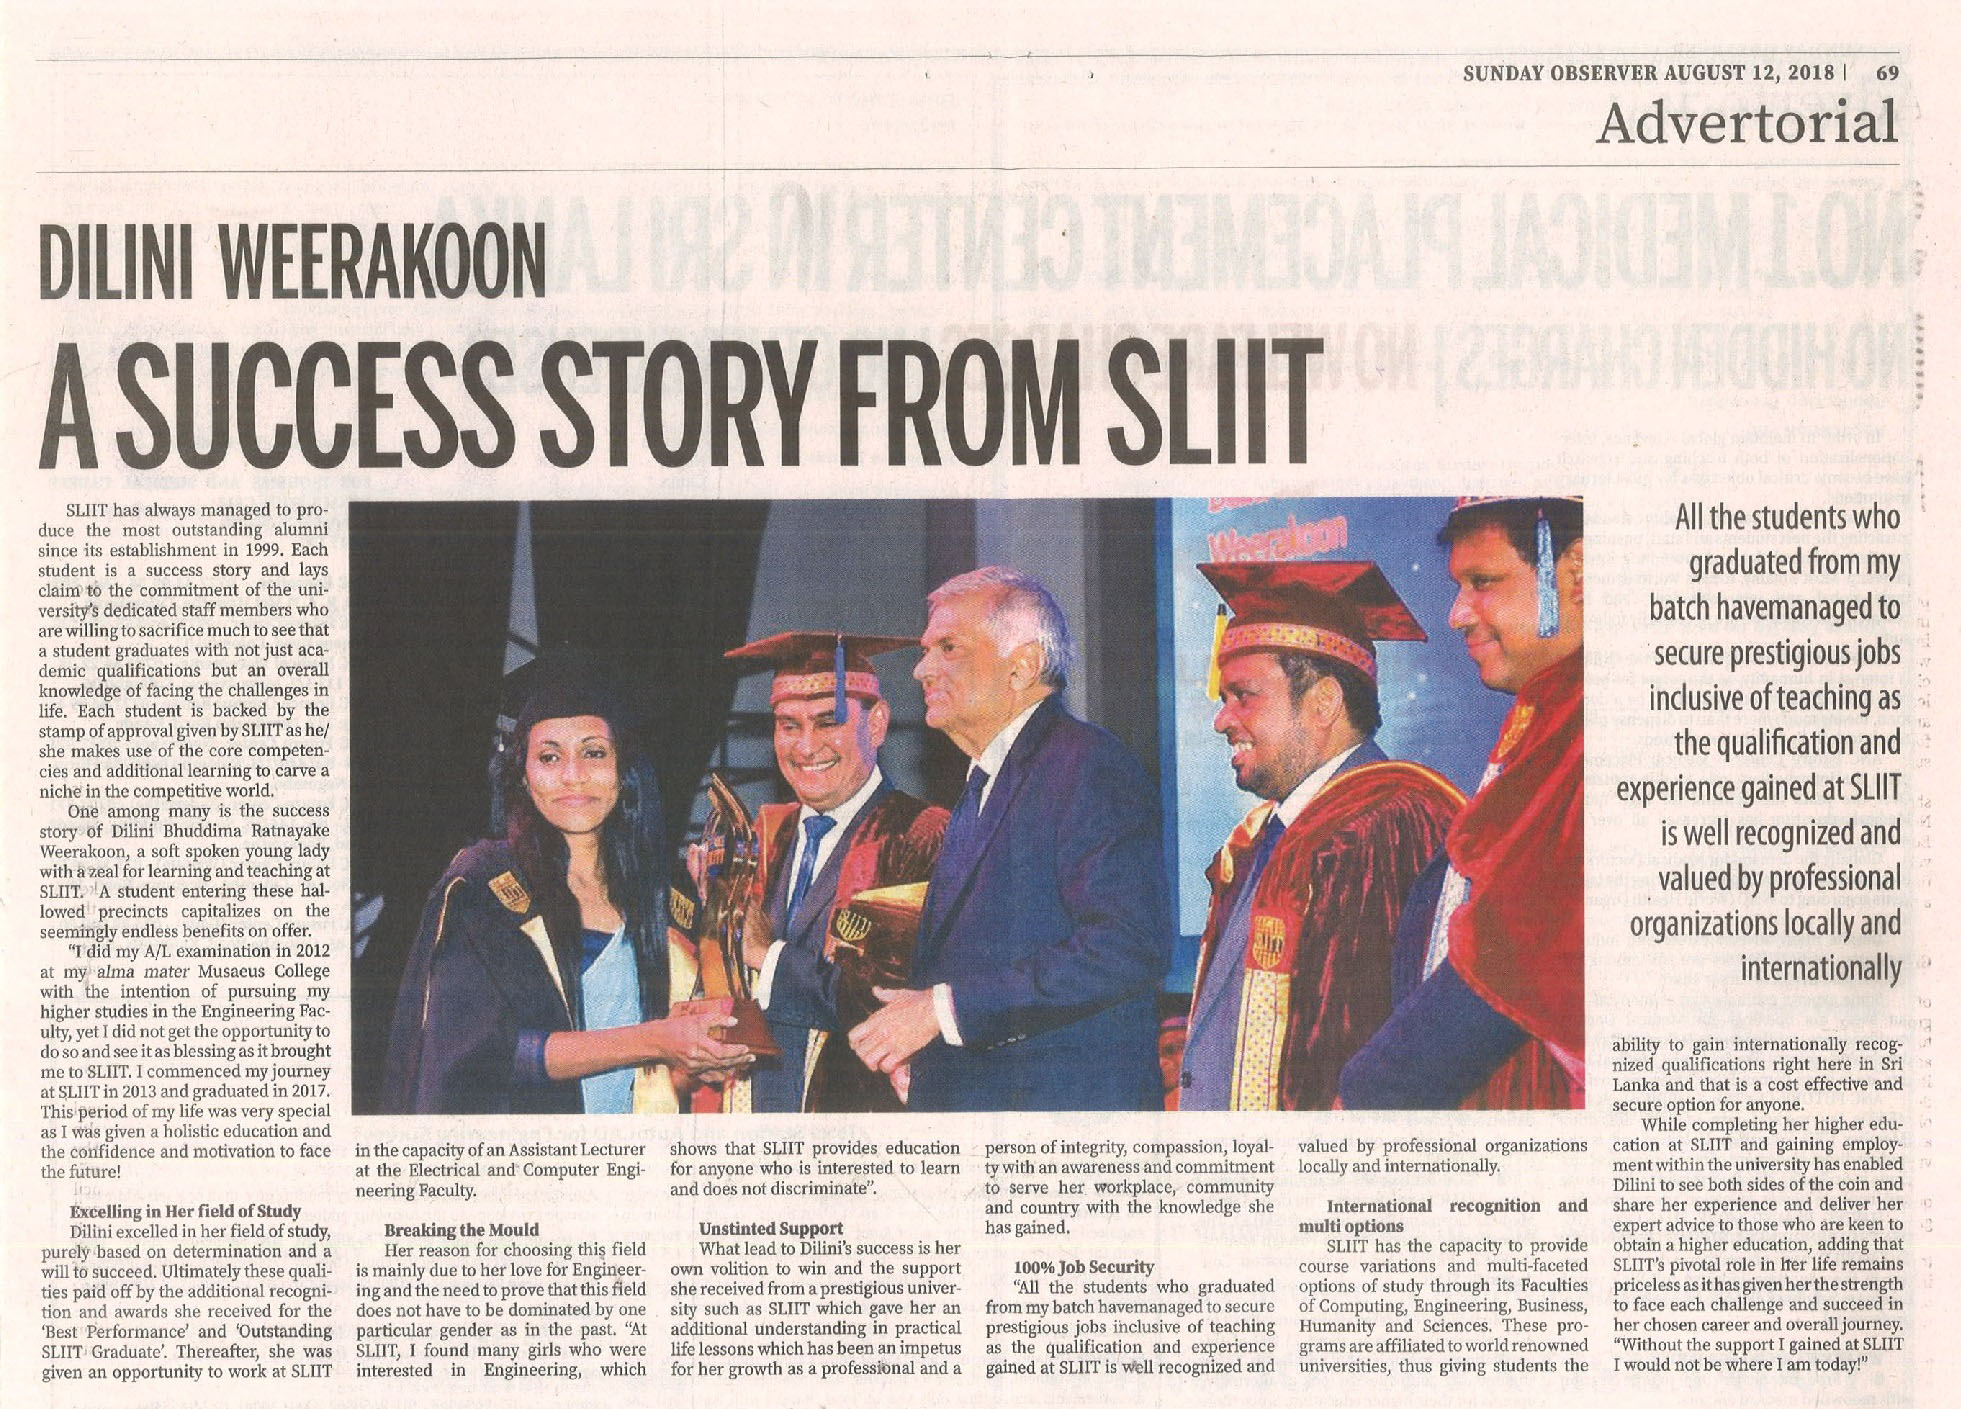 A-Success-Story-from-SLIIT-Dilini-Weerakoon-Sunday-Observer-12.08.2018